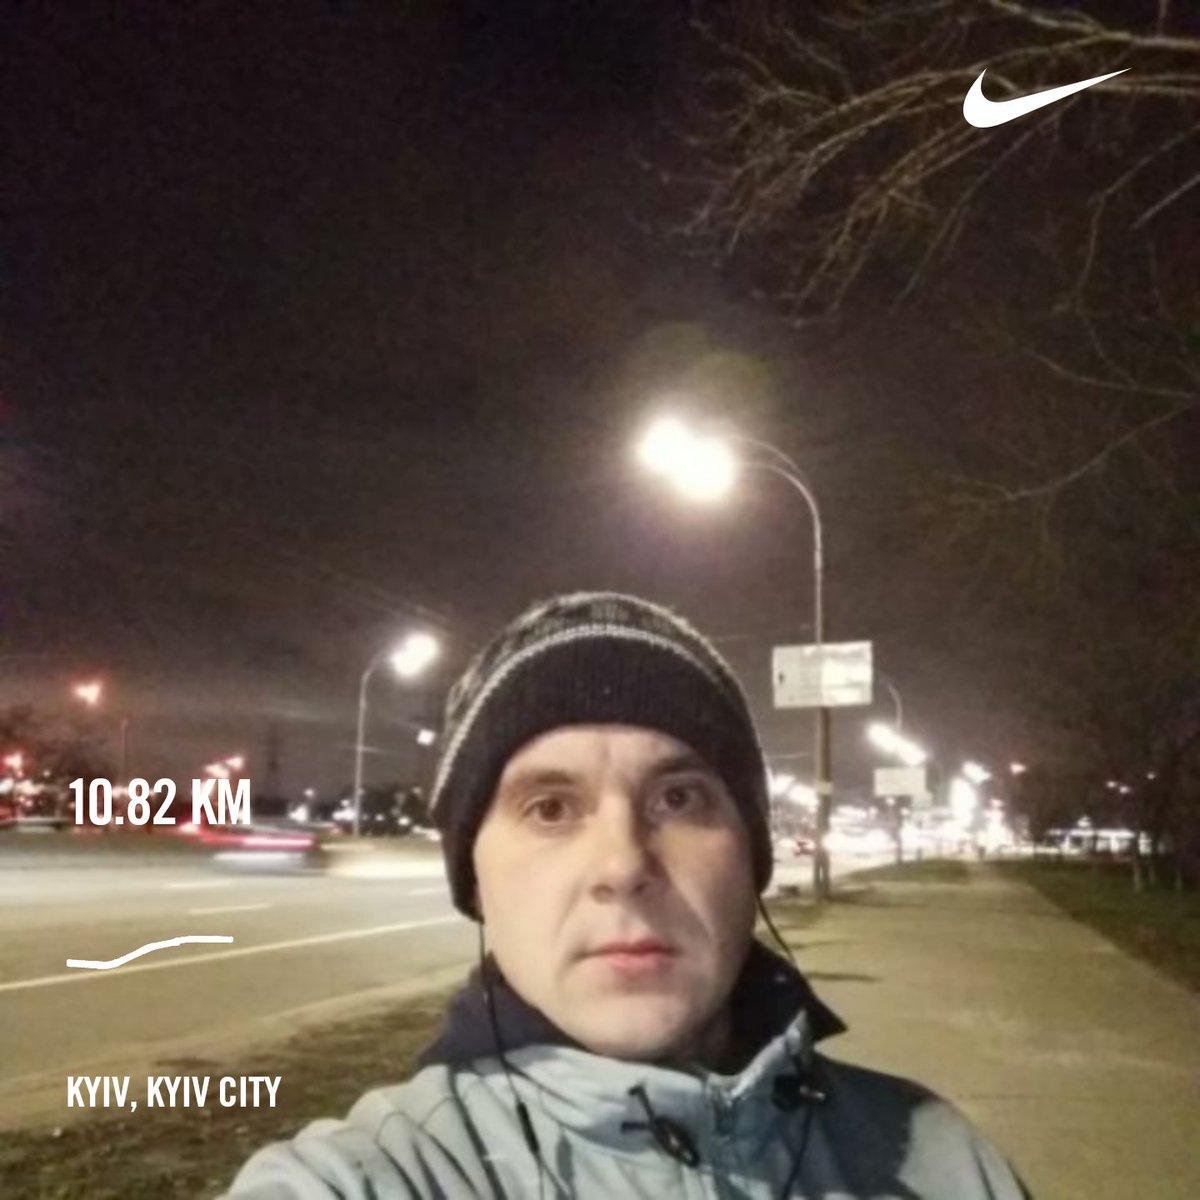 Done 10.82 km in 60 min.Better pace now - 5.34 min/km.+2C. #nikerunclub #sundayrun #eveningrun #winter #moreruns #nonstop #keepfit #sports #worldrunner #runforpeace #nightlights #overthebridge #gogogopic.twitter.com/CAYJbHgSBv